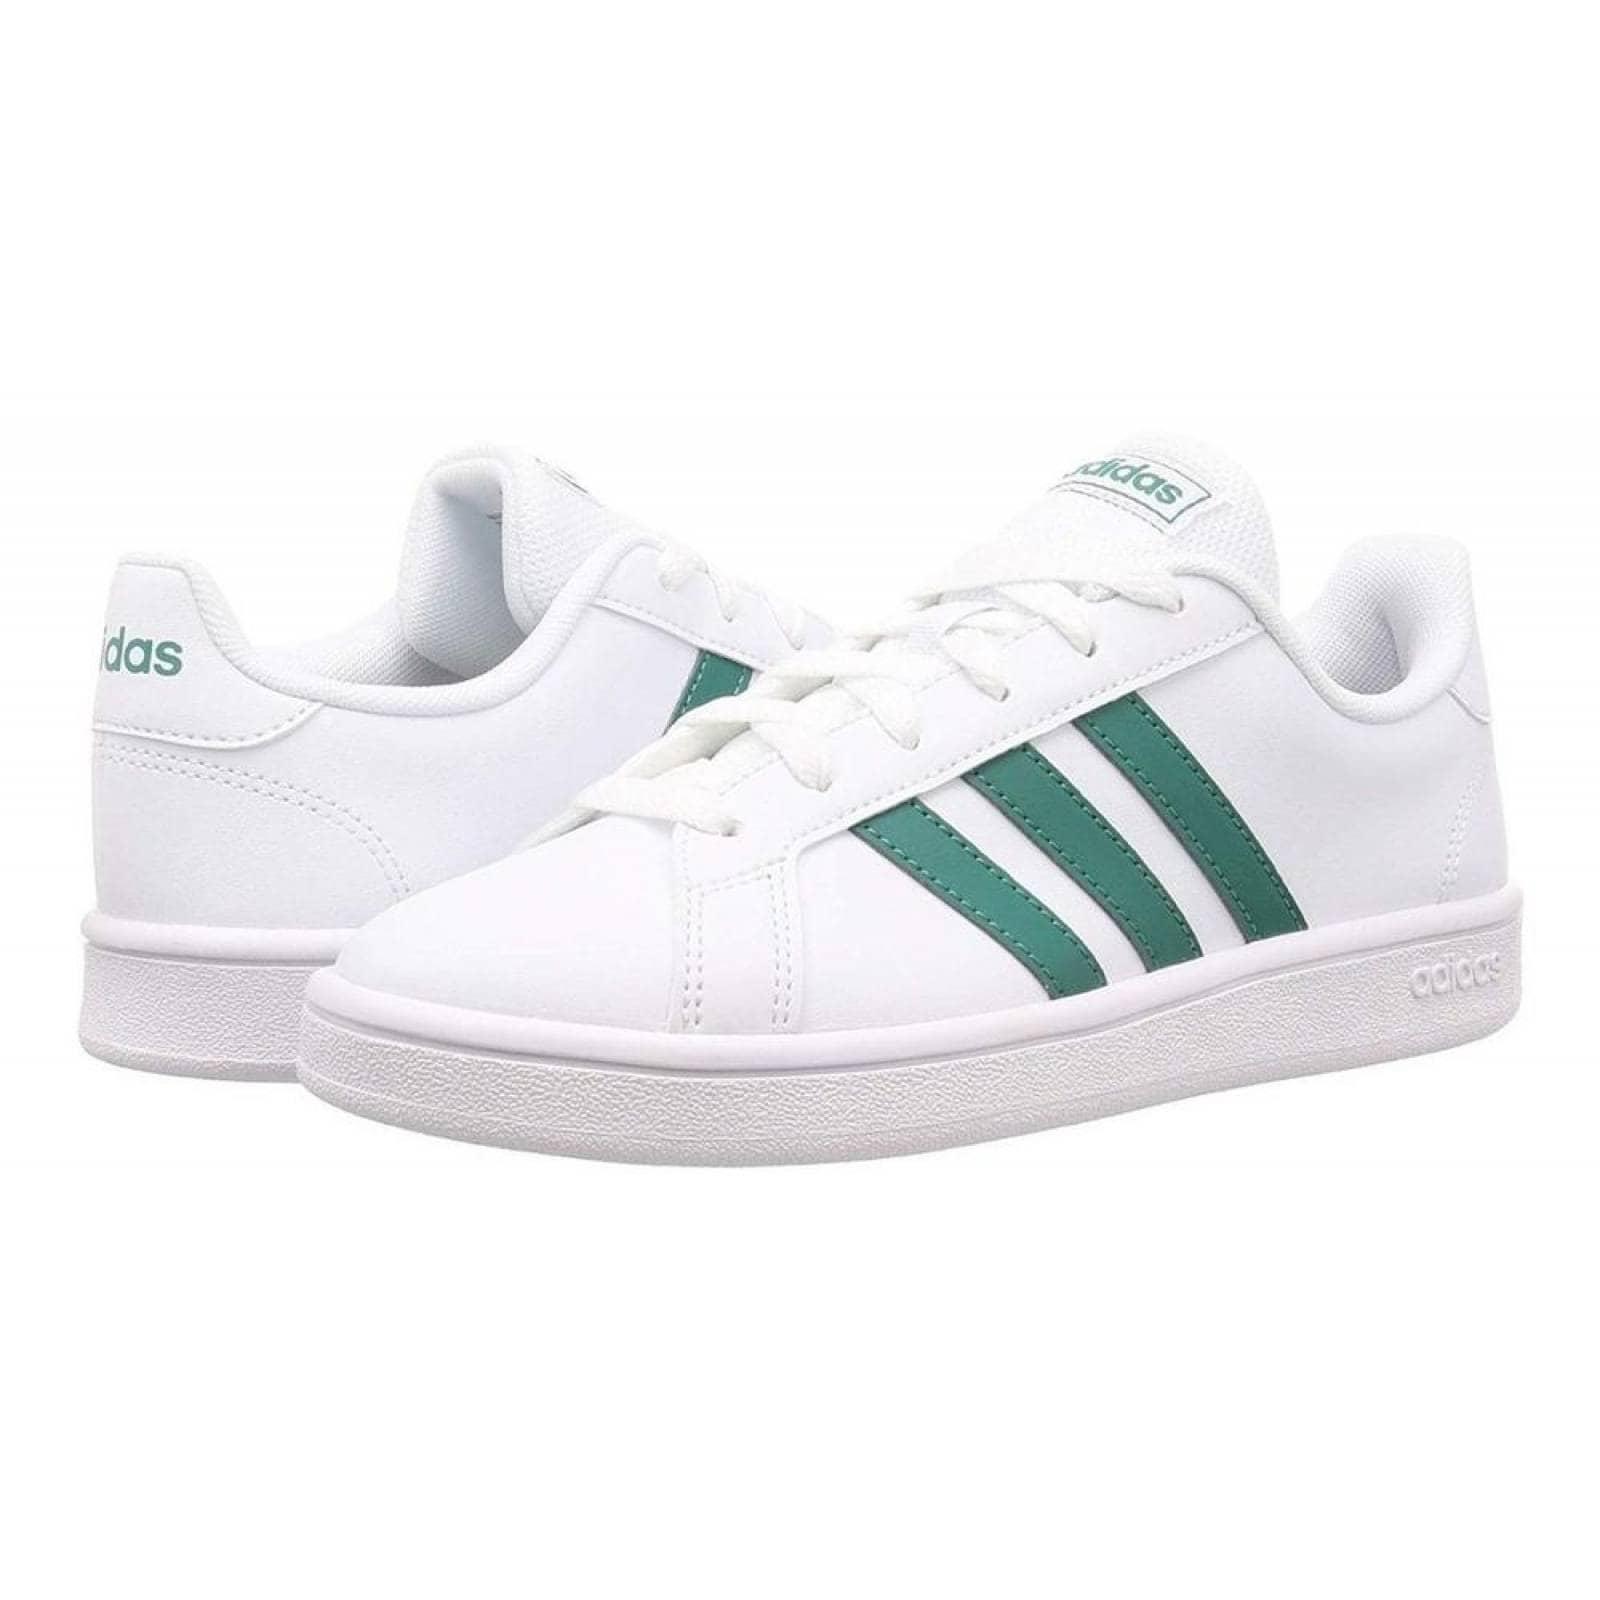 Tenis Adidas Grand Court Base EE7905 Blanco Franjas Verdes Hombre